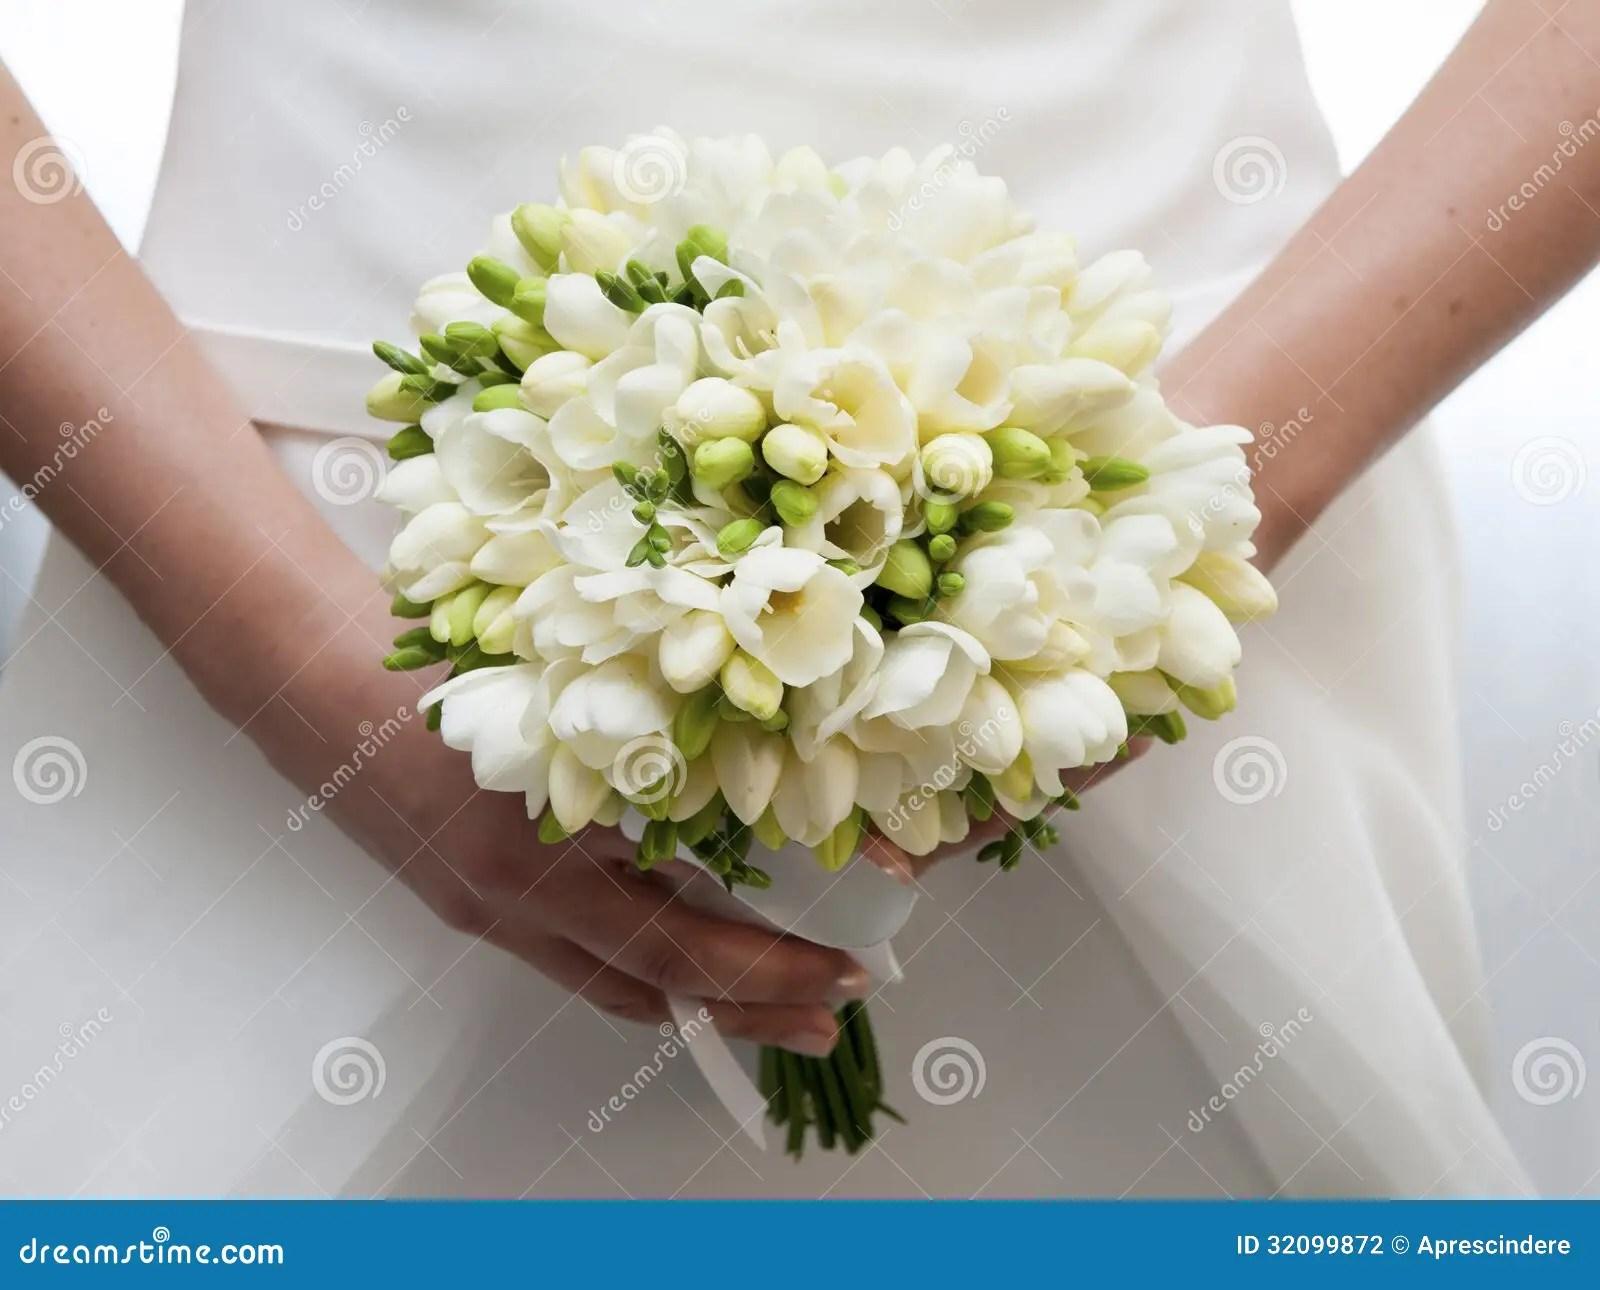 wedding bouquet wedding bouquet Wedding bouquet Stock Photography